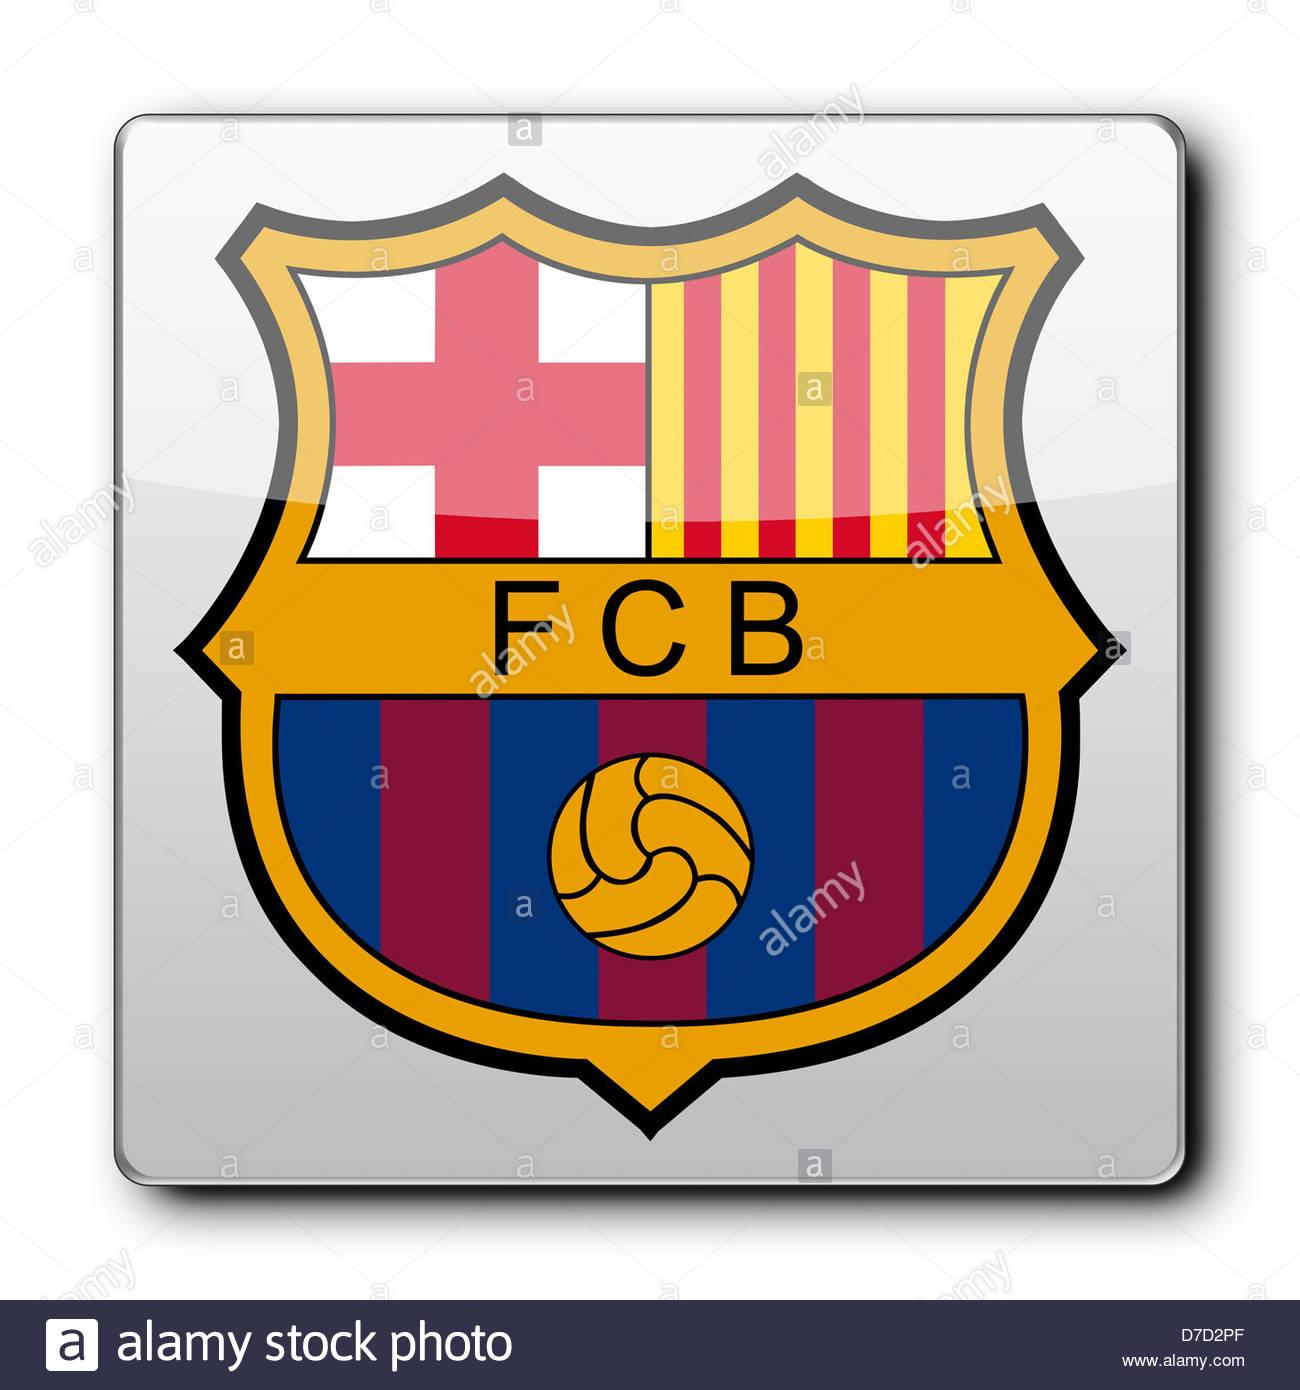 Fc barcelona logo icon app banner flag stock photo royalty free fc barcelona logo icon app banner flag biocorpaavc